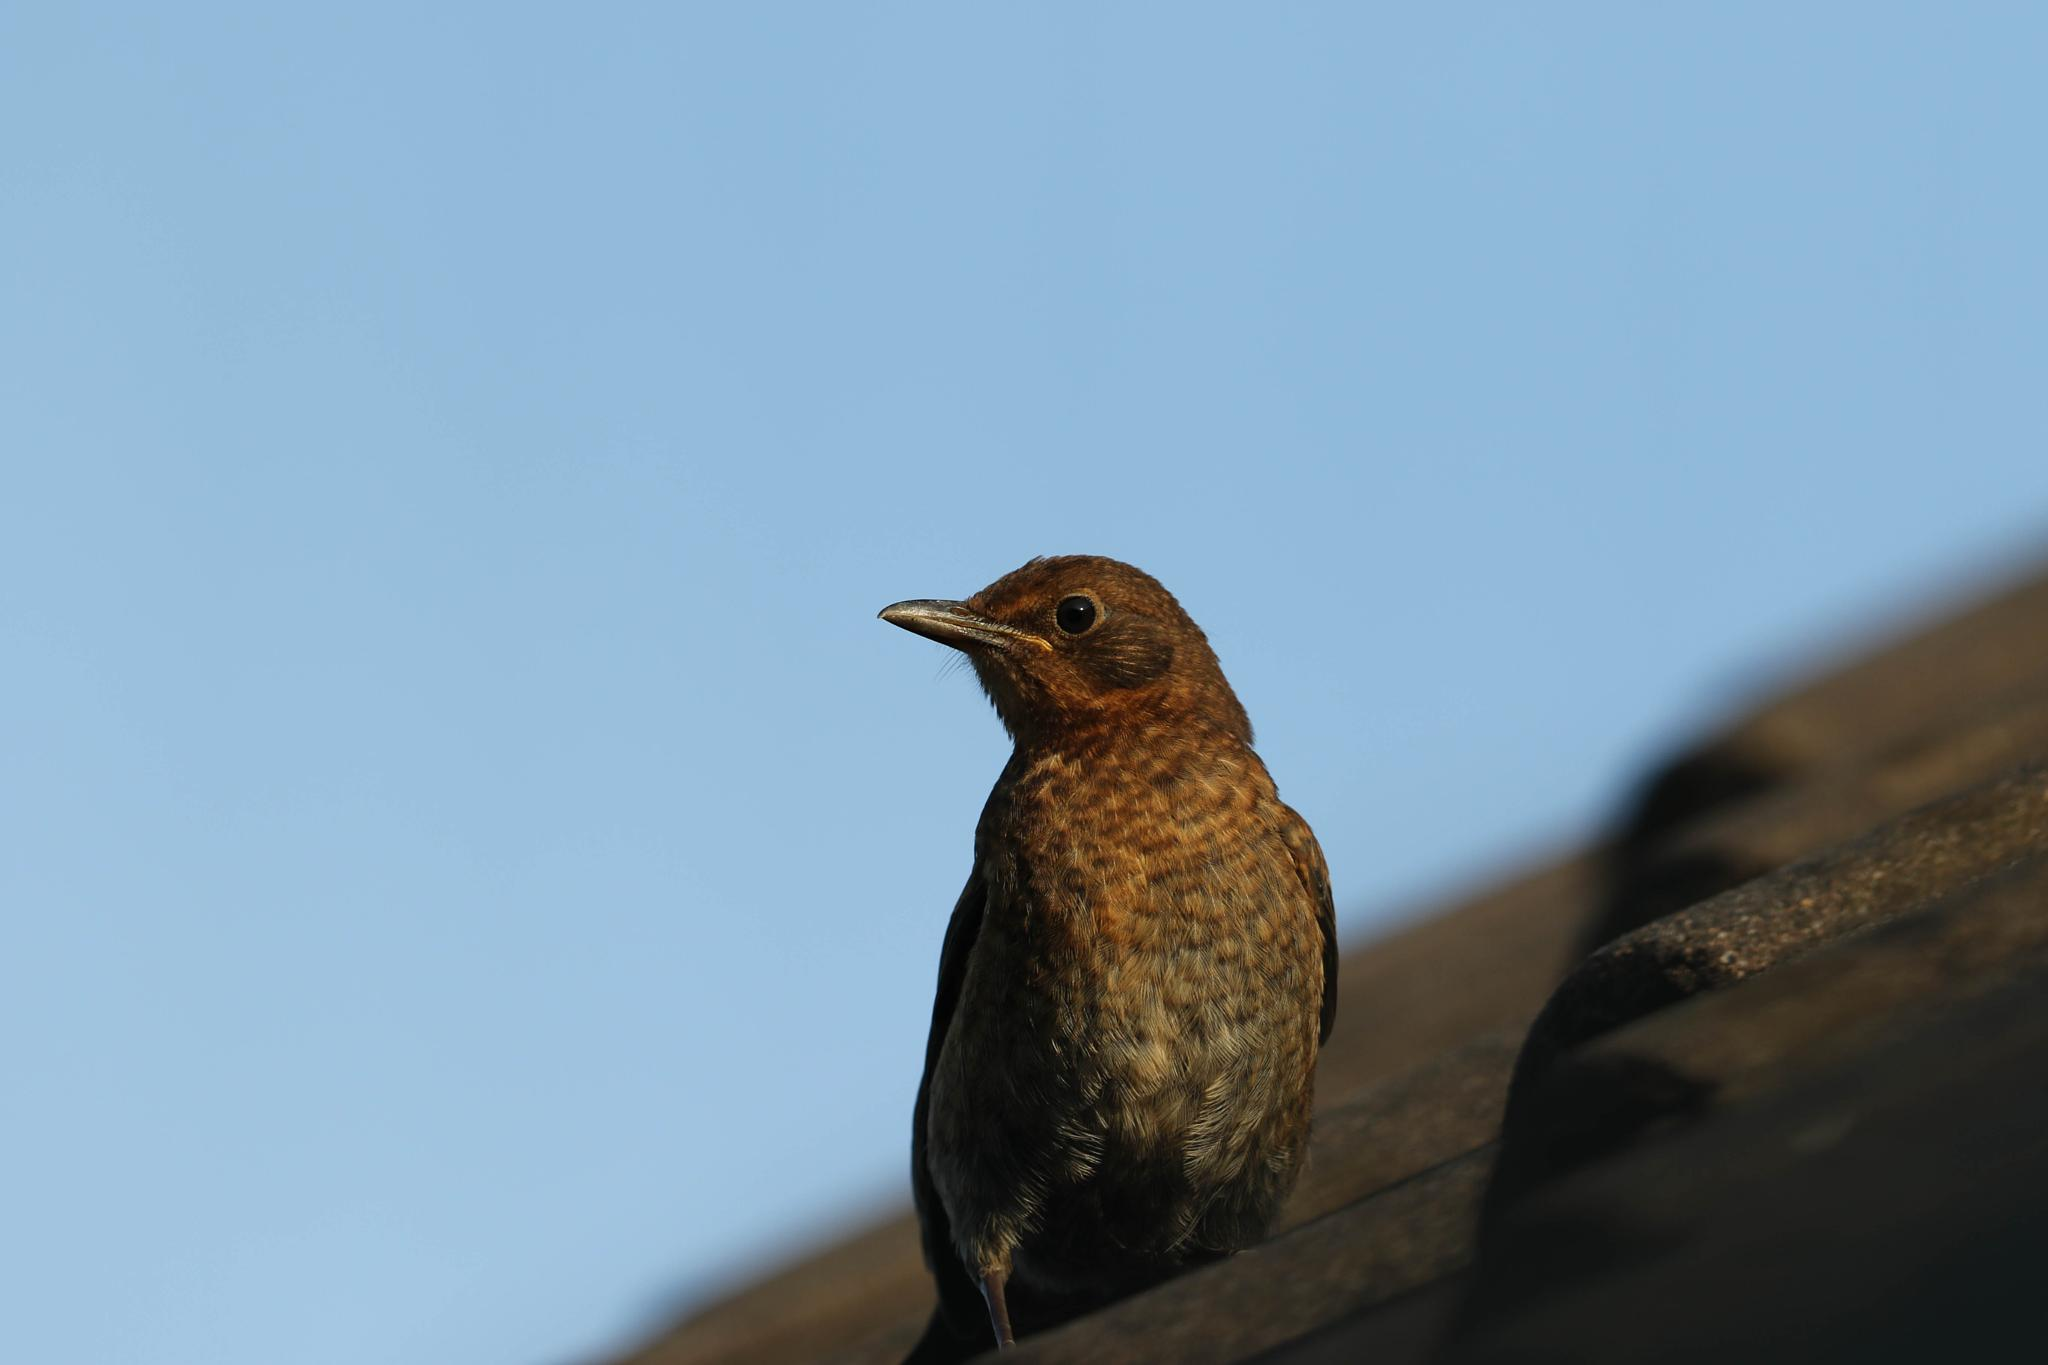 bird by emmanuel liegeois